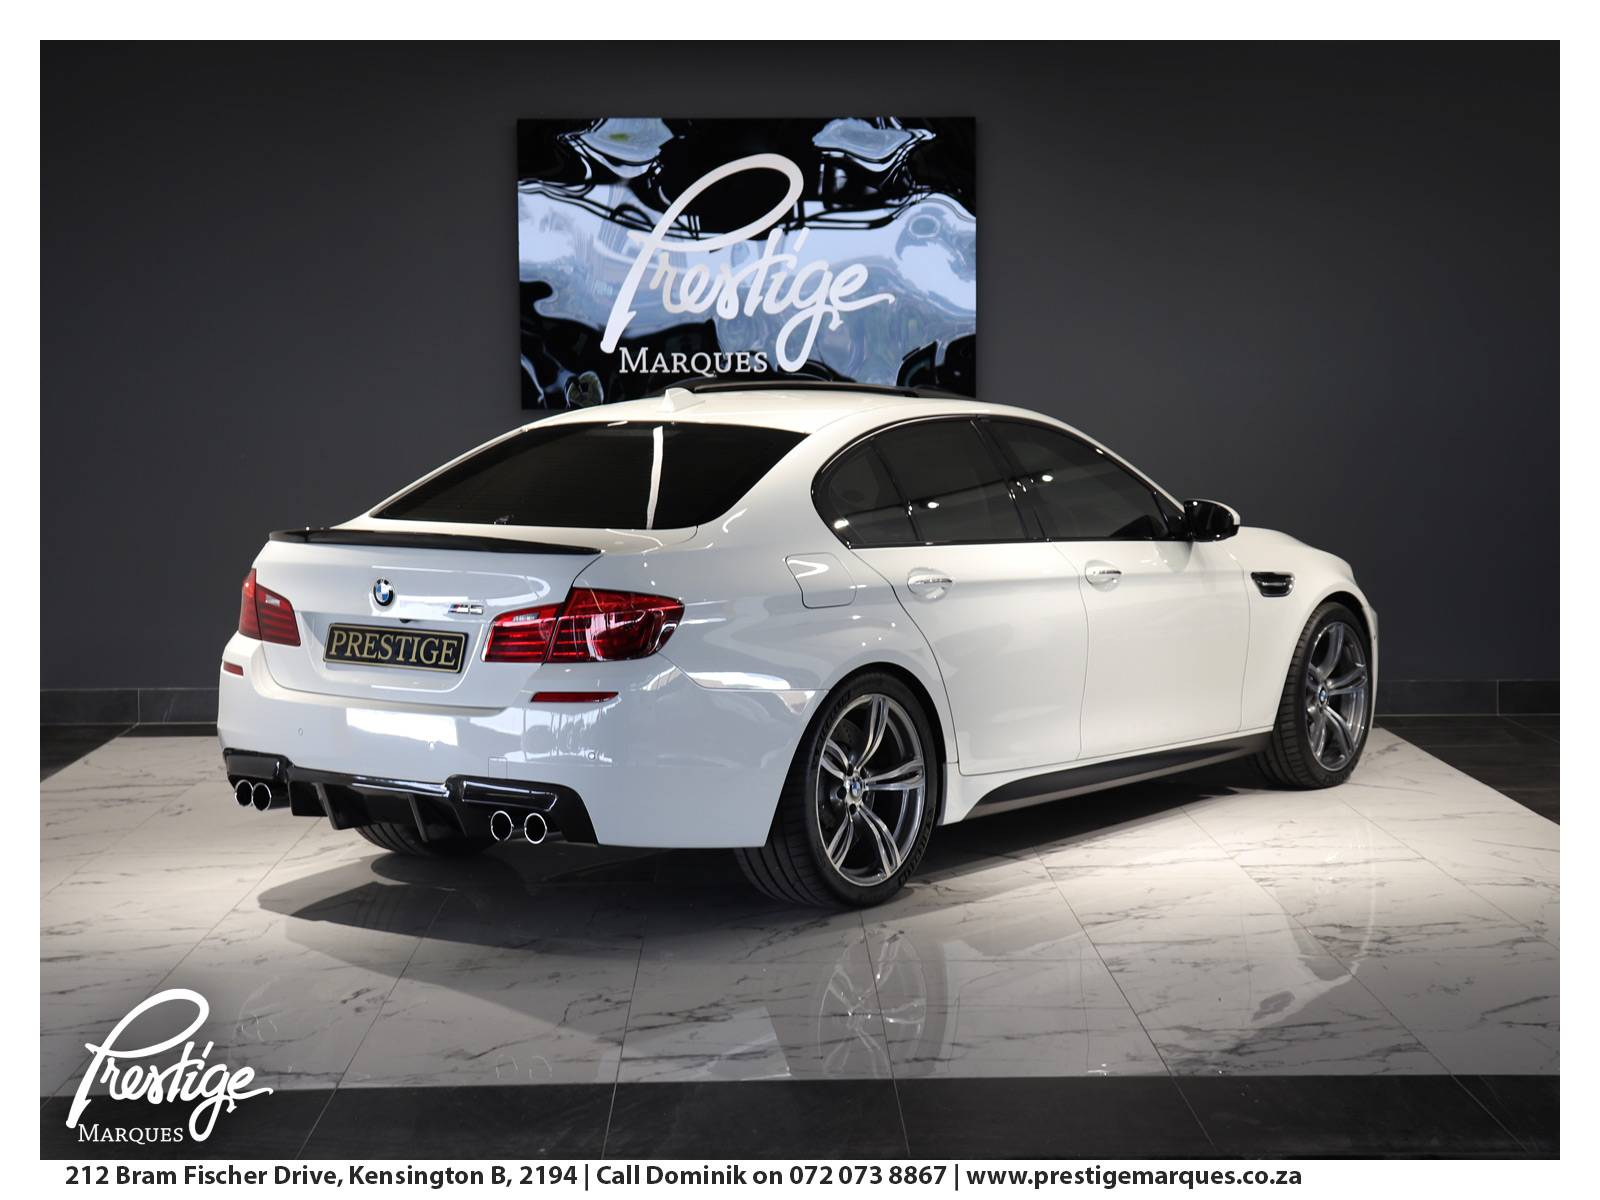 2015-BMW-F10-M5-MDCT-Prestige-Marques-Randburg-Sandton-3